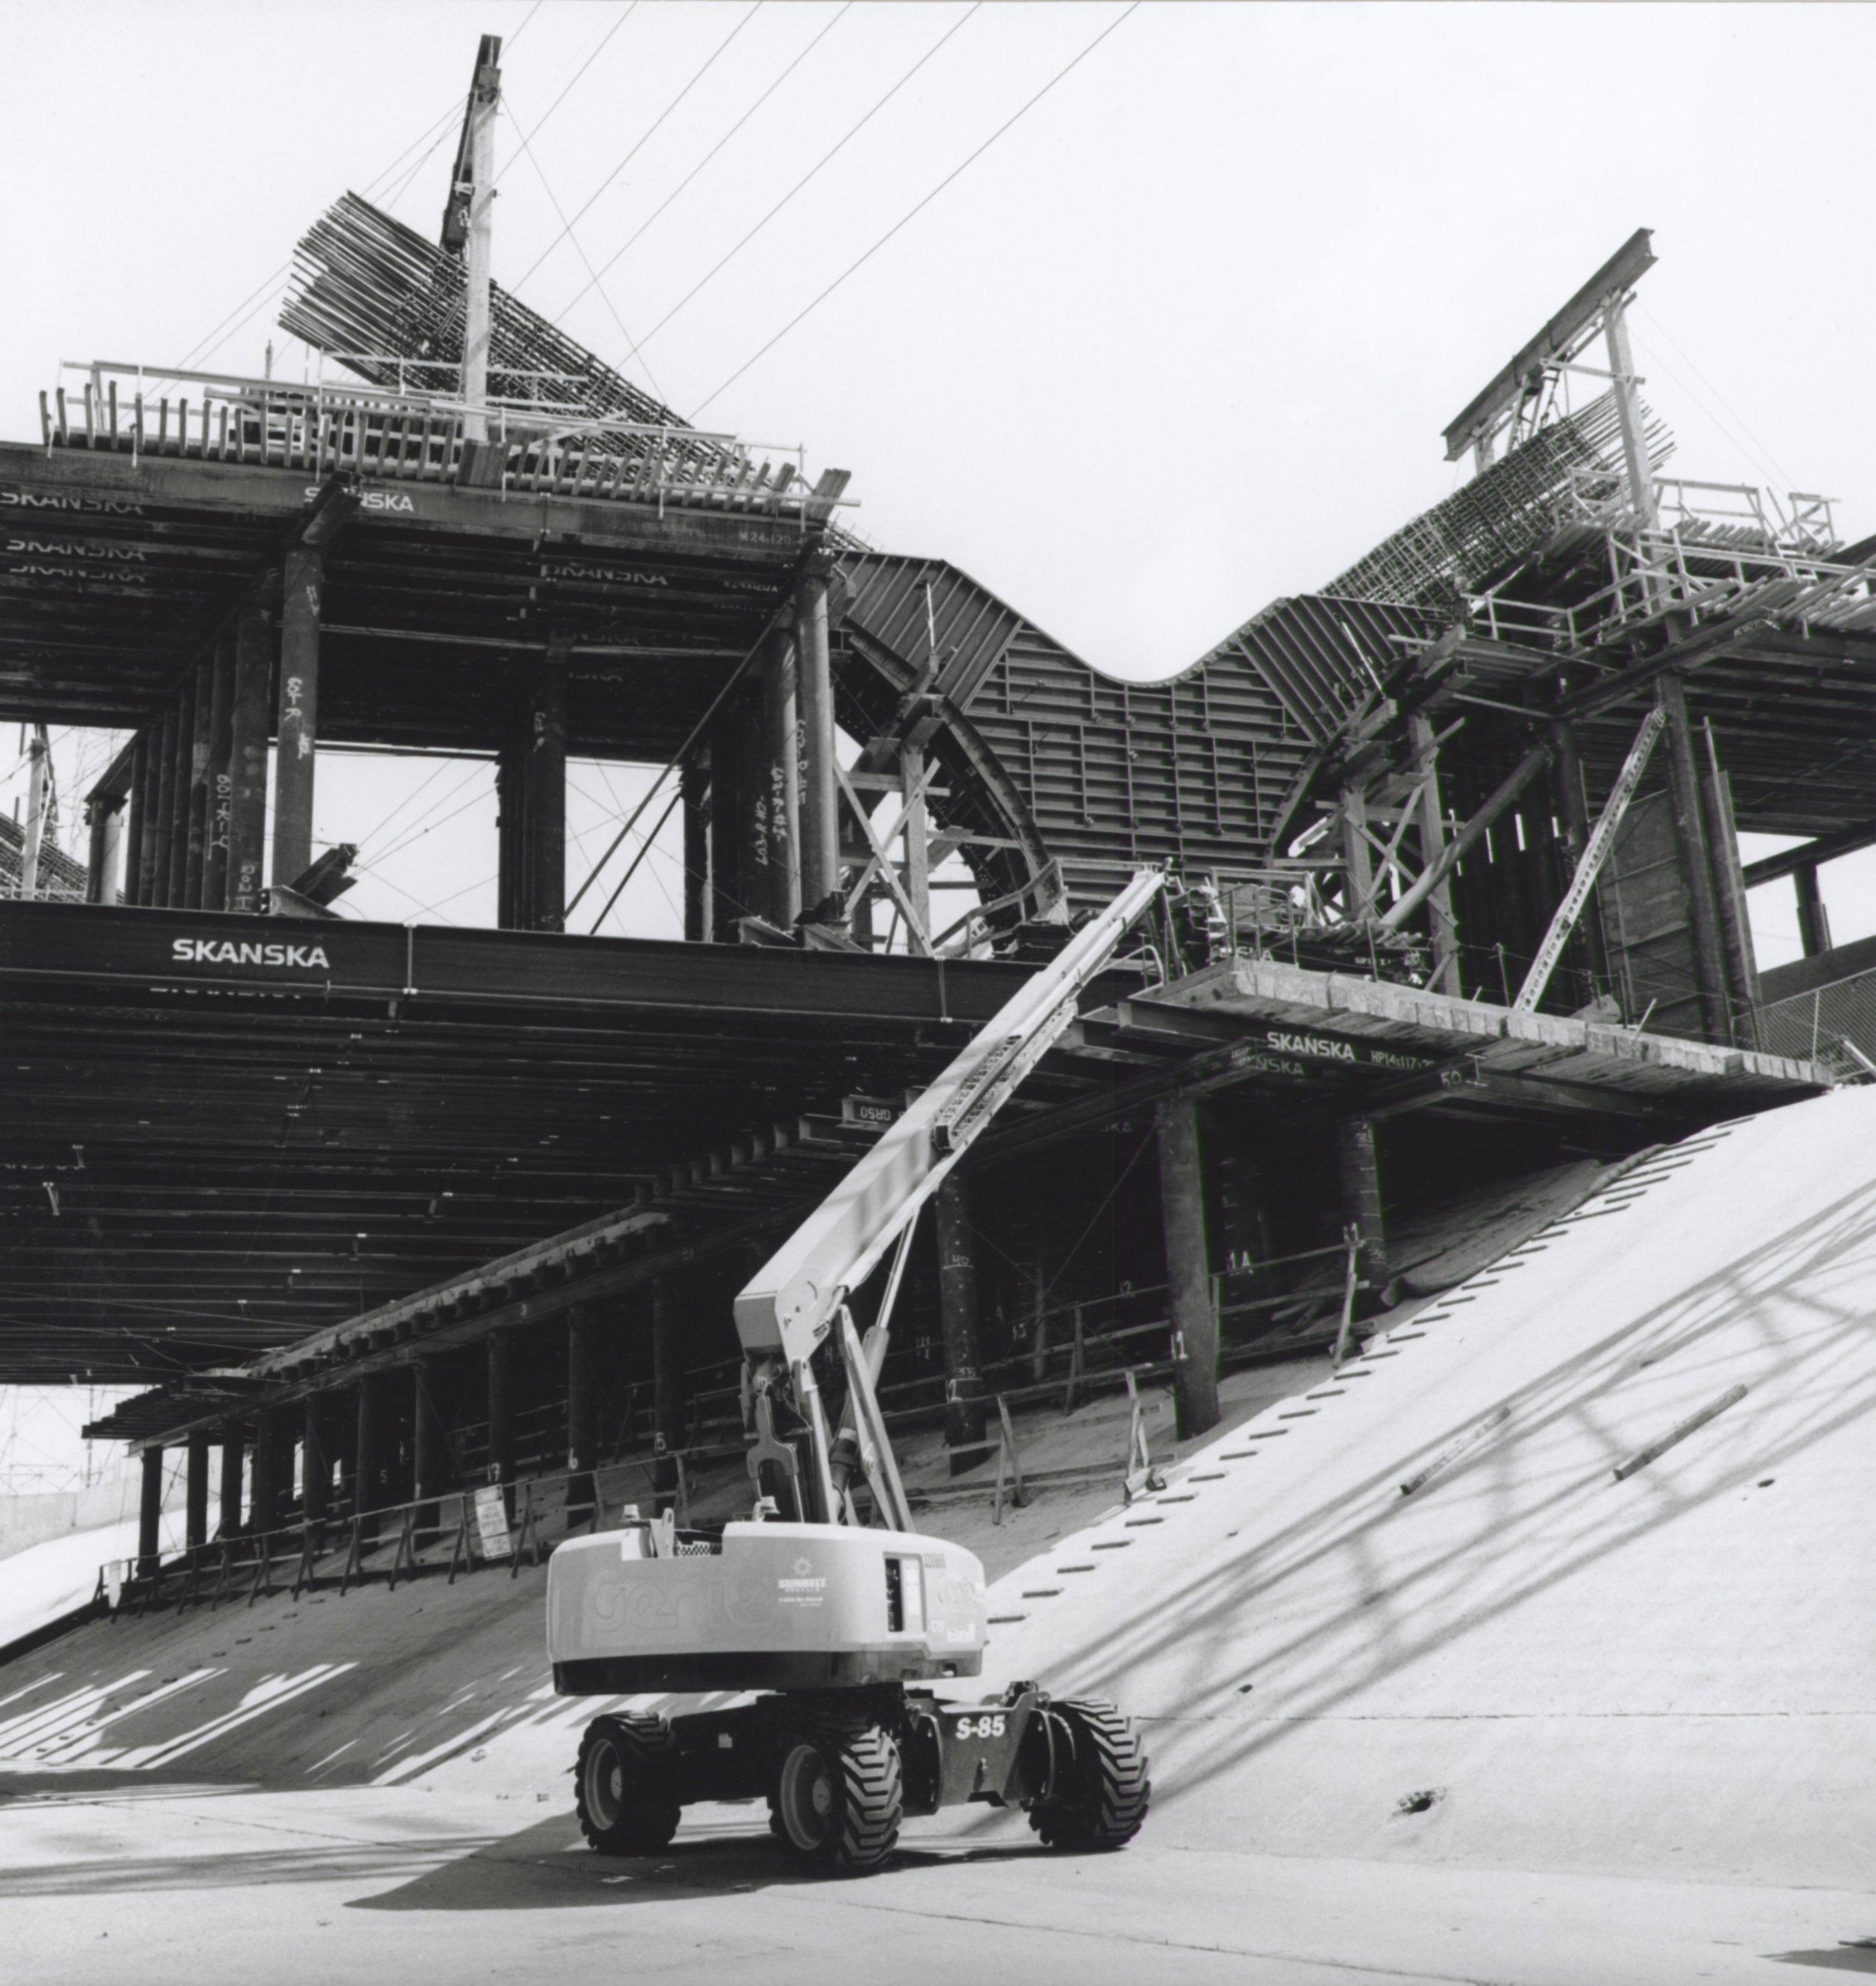 LA Riverbed View of Y Angle Concrete Form - 2018